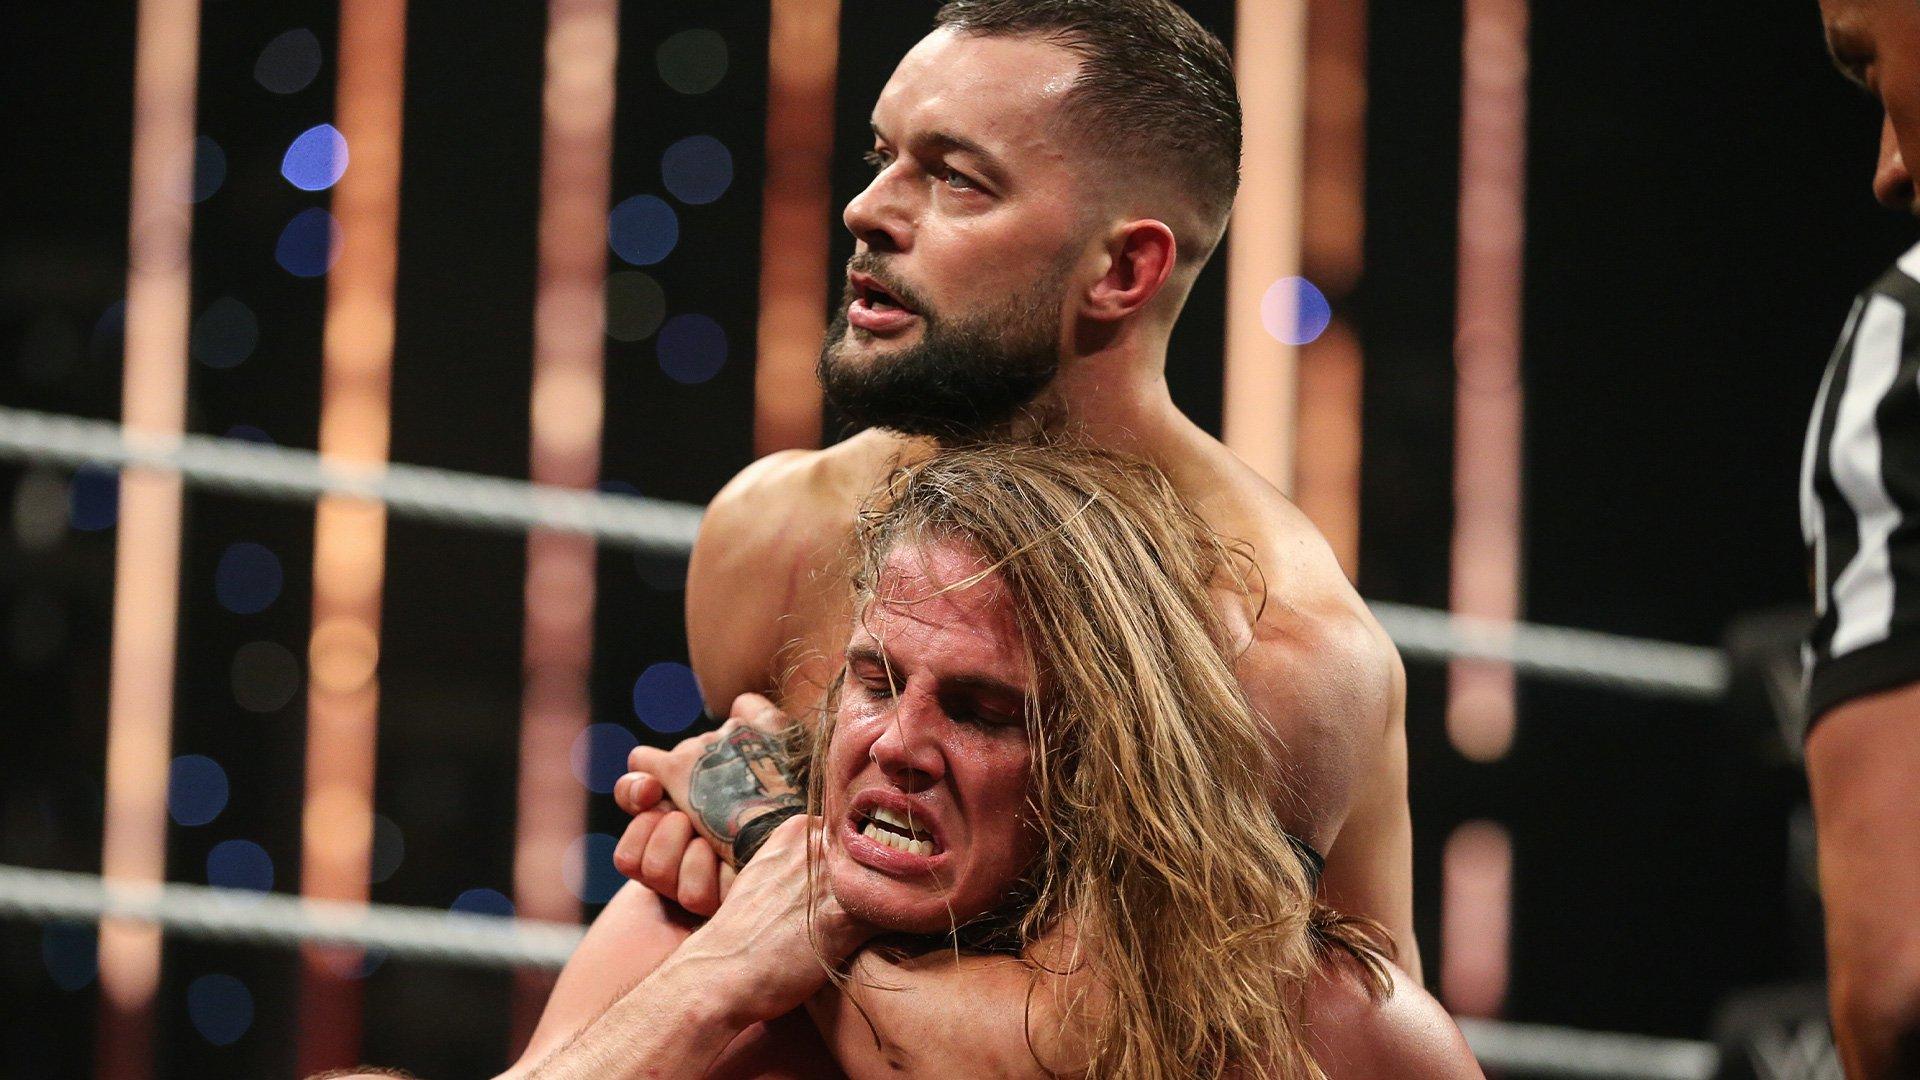 Matt Riddle Locks In Against Finn Bálor Takeover Wargames Wwe Network Exclusive